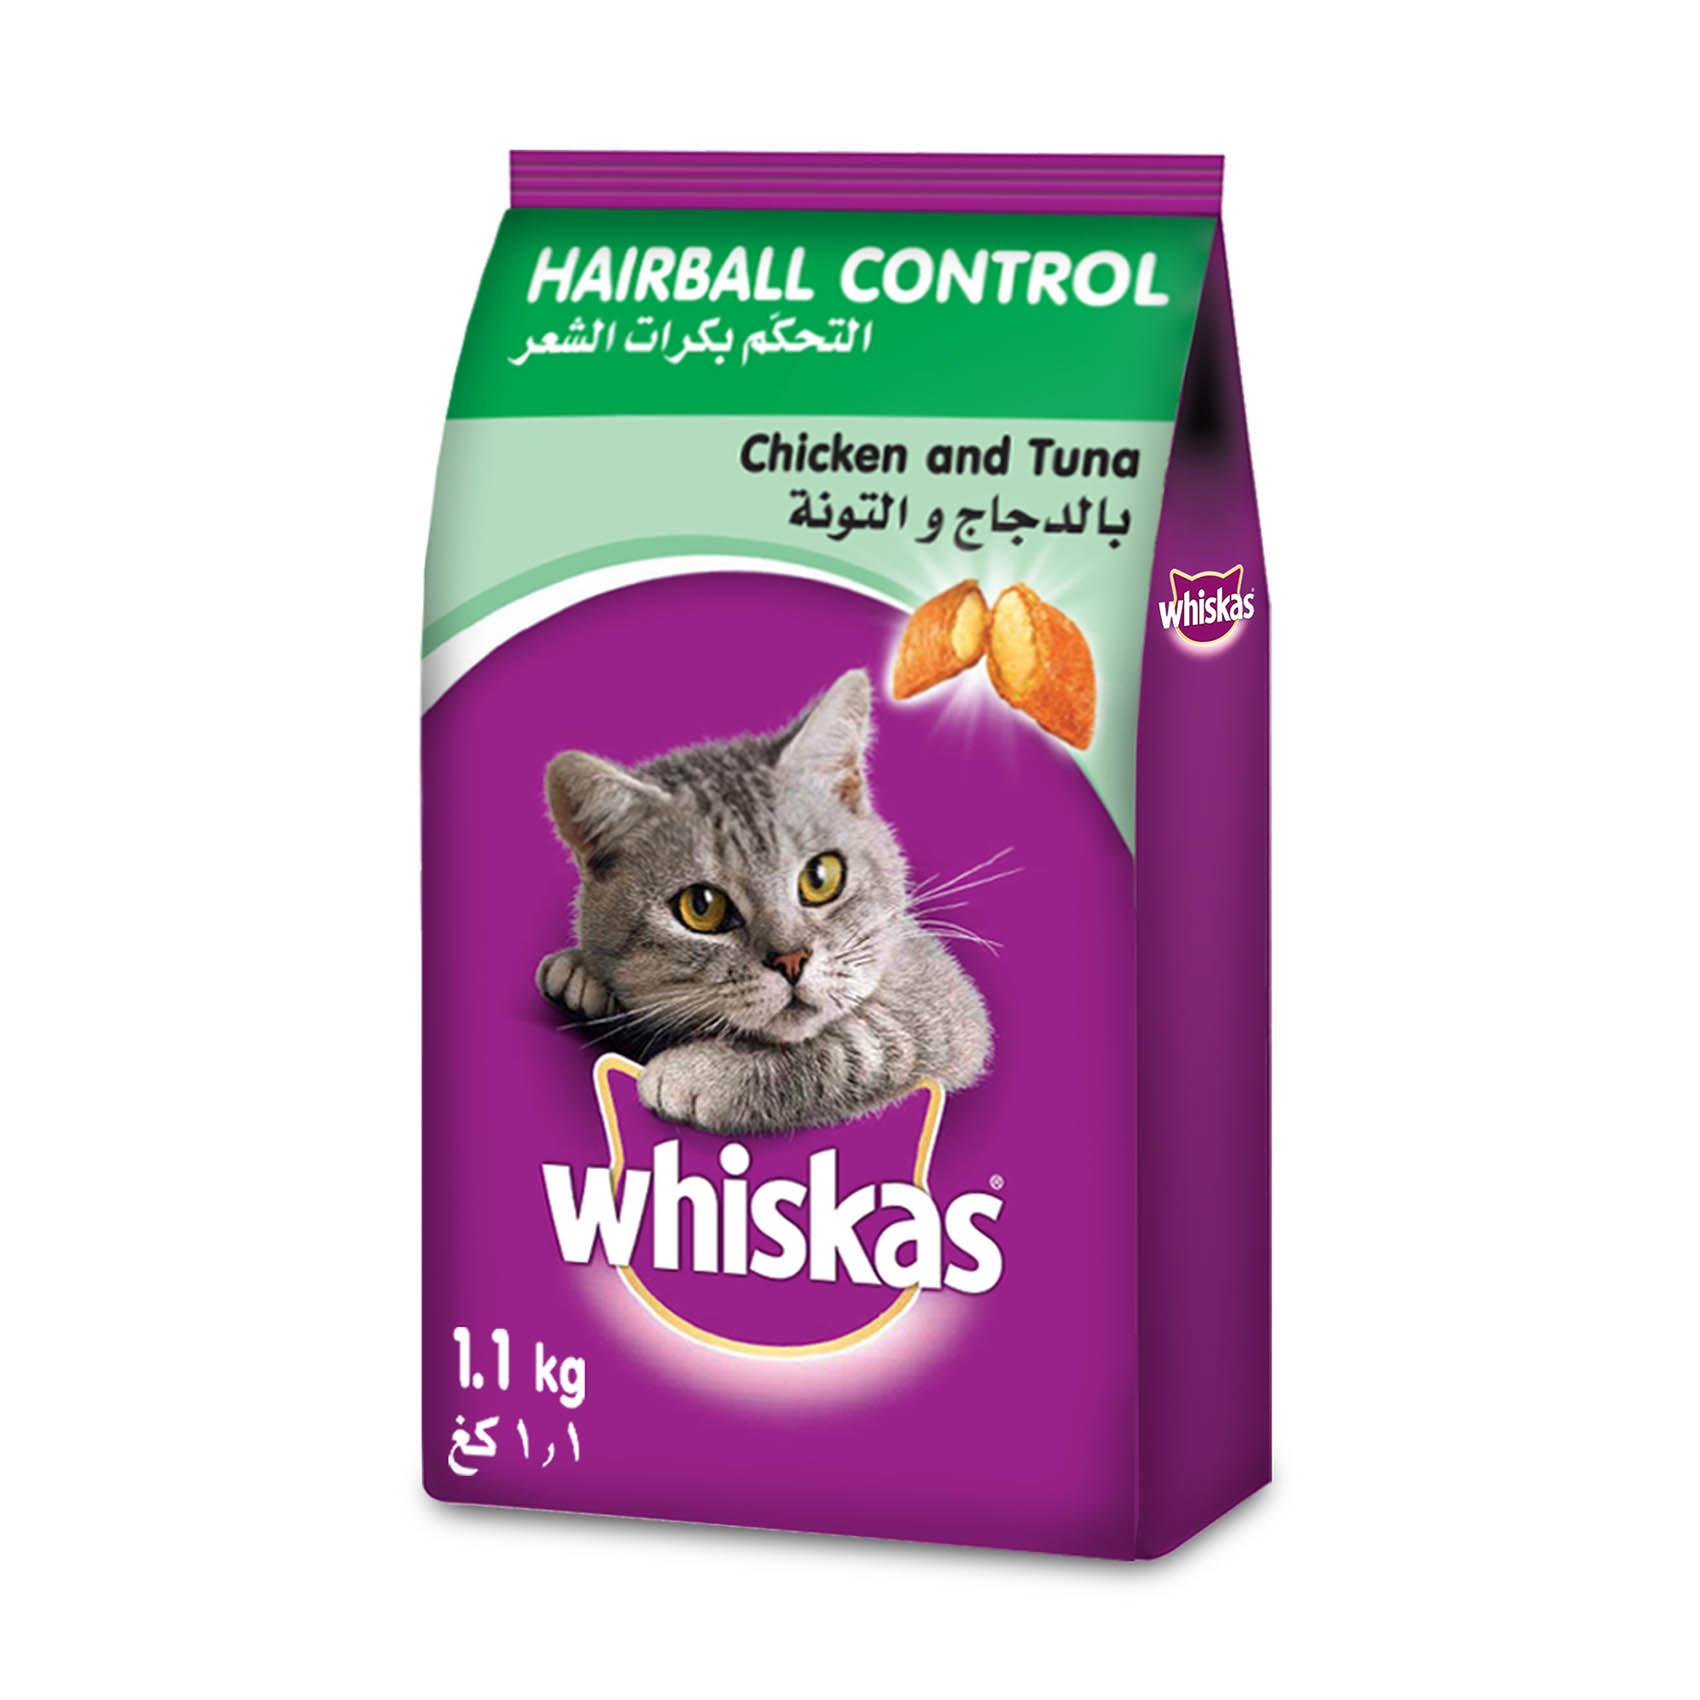 WHISKAS HB CONTROL 1.1KG